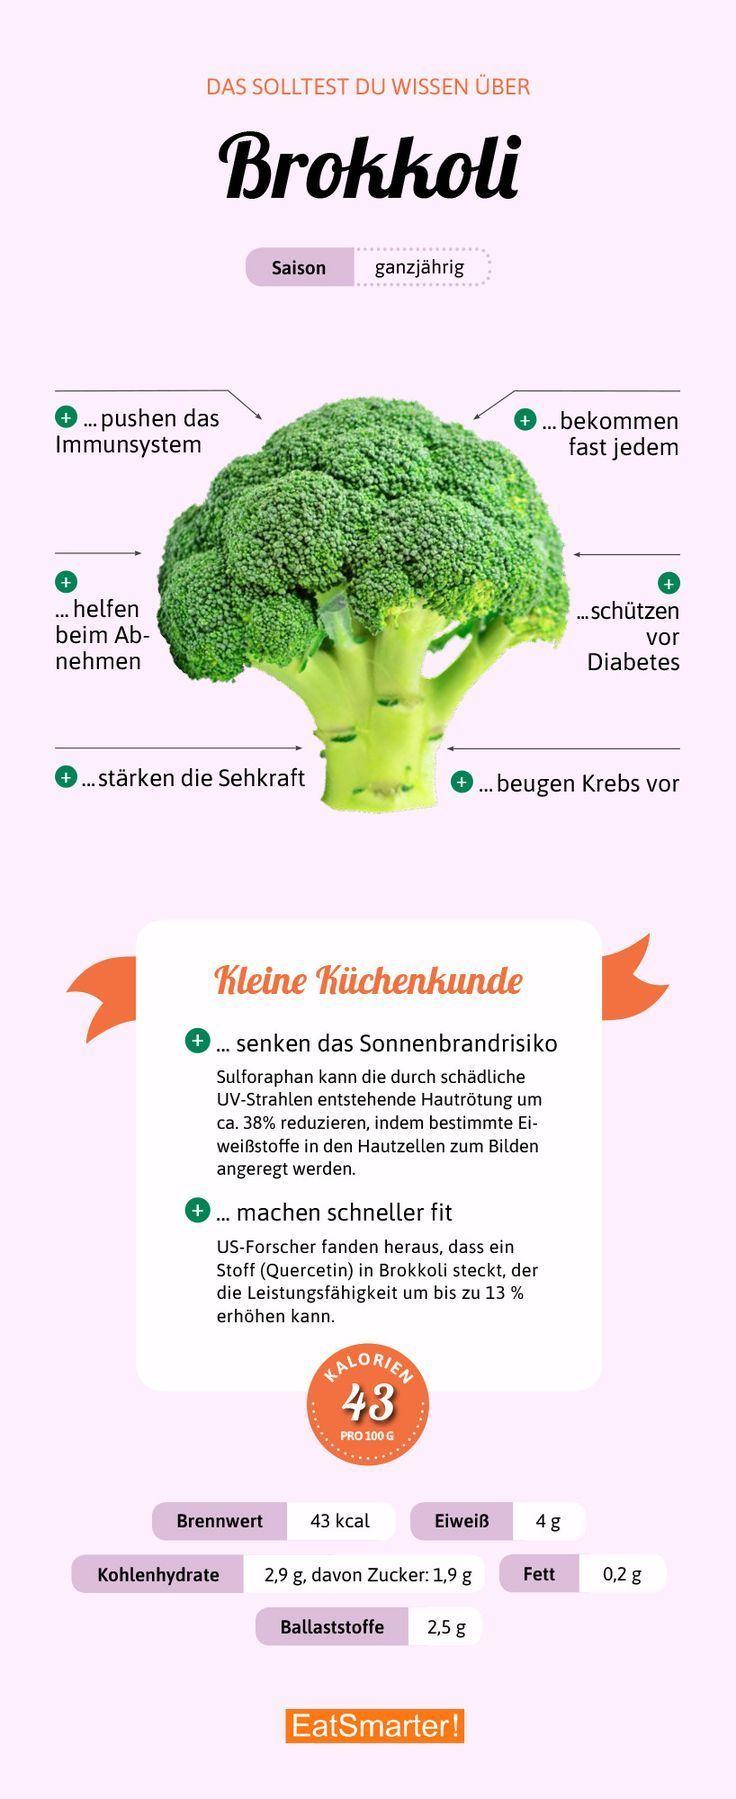 Brokkoli Brokkoli Nutrition nutrition facts broccoli